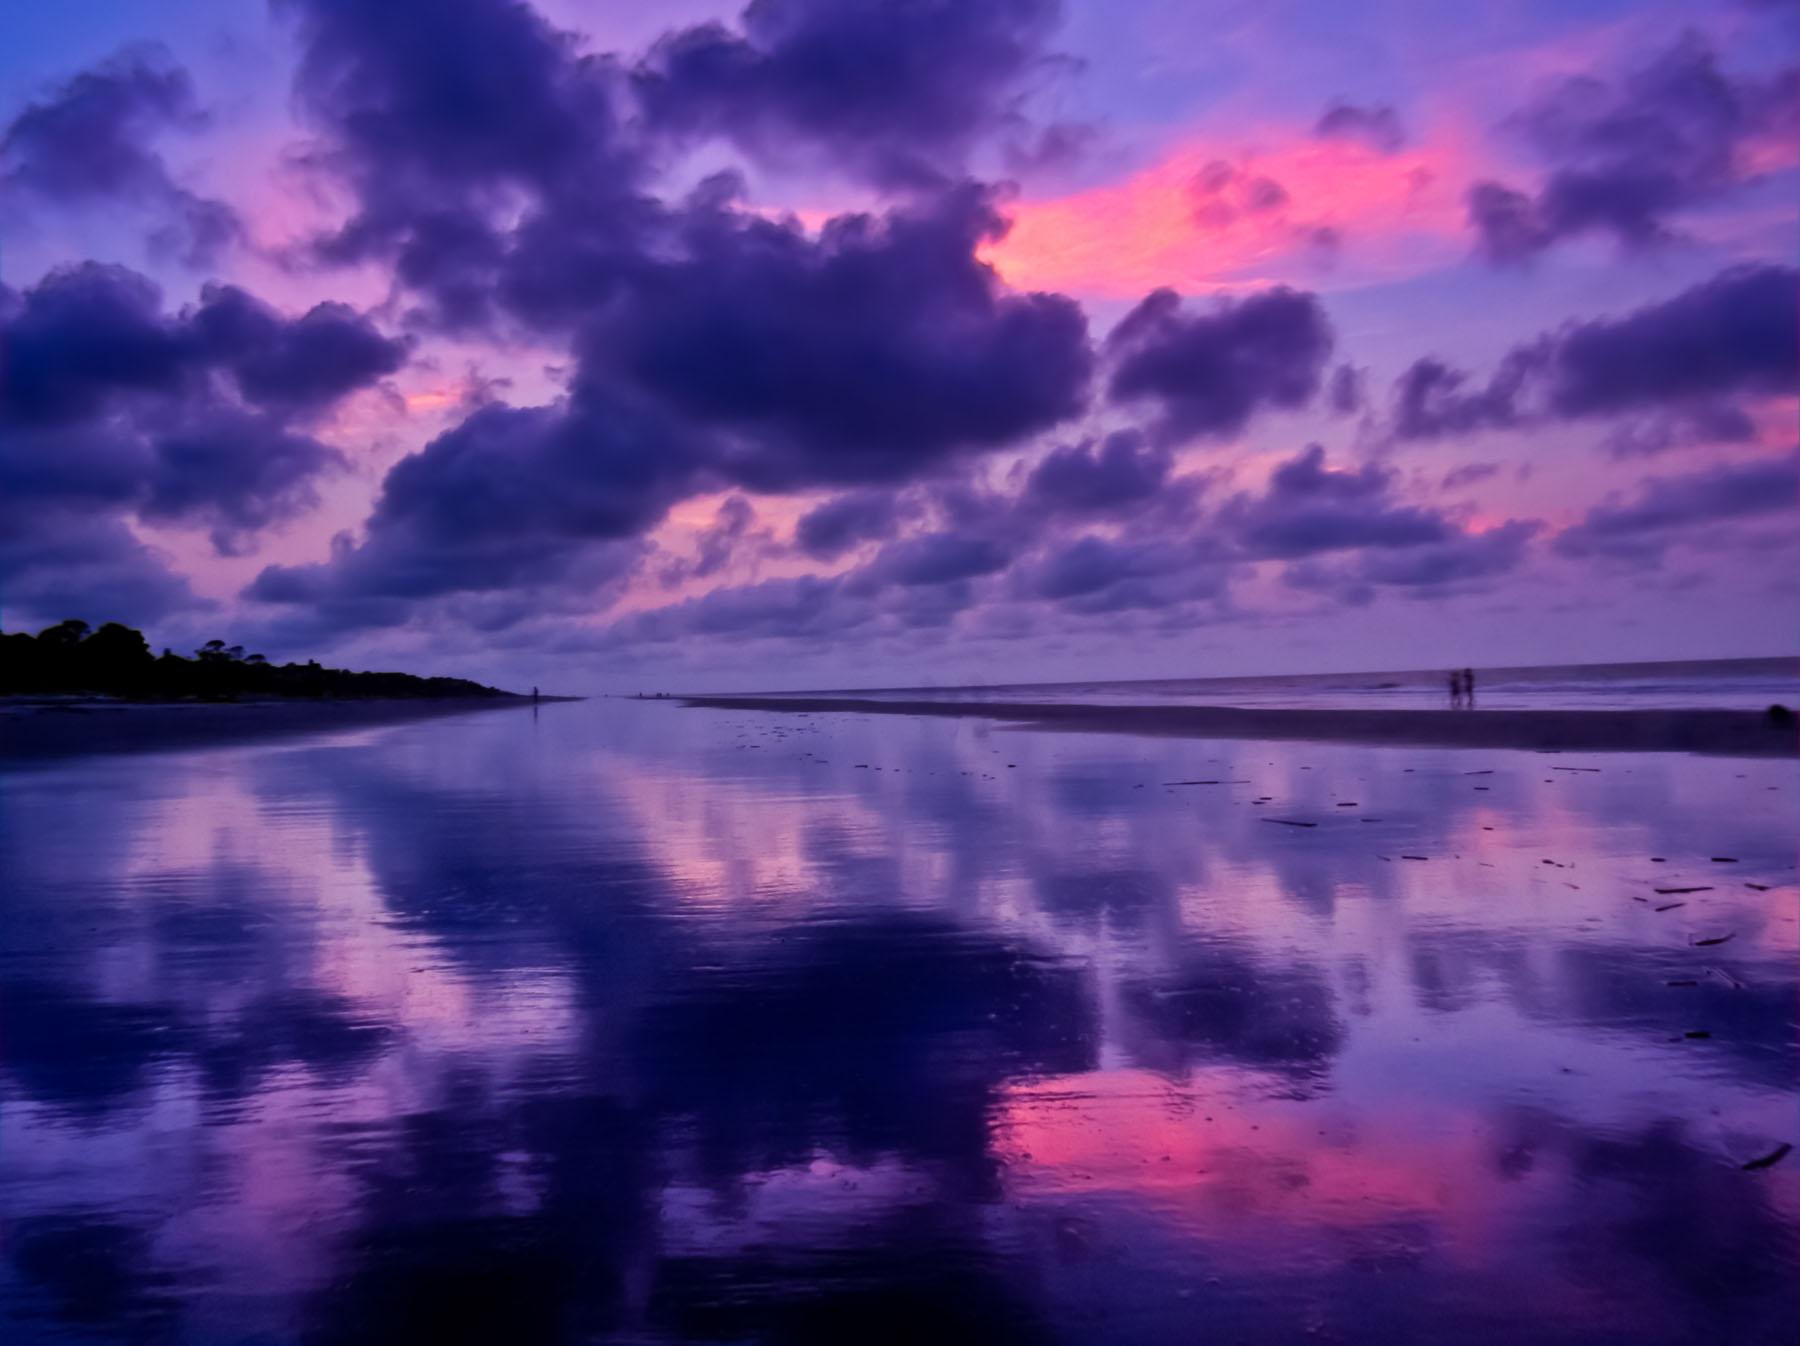 nature photography sunrise and sunset photos kranchev